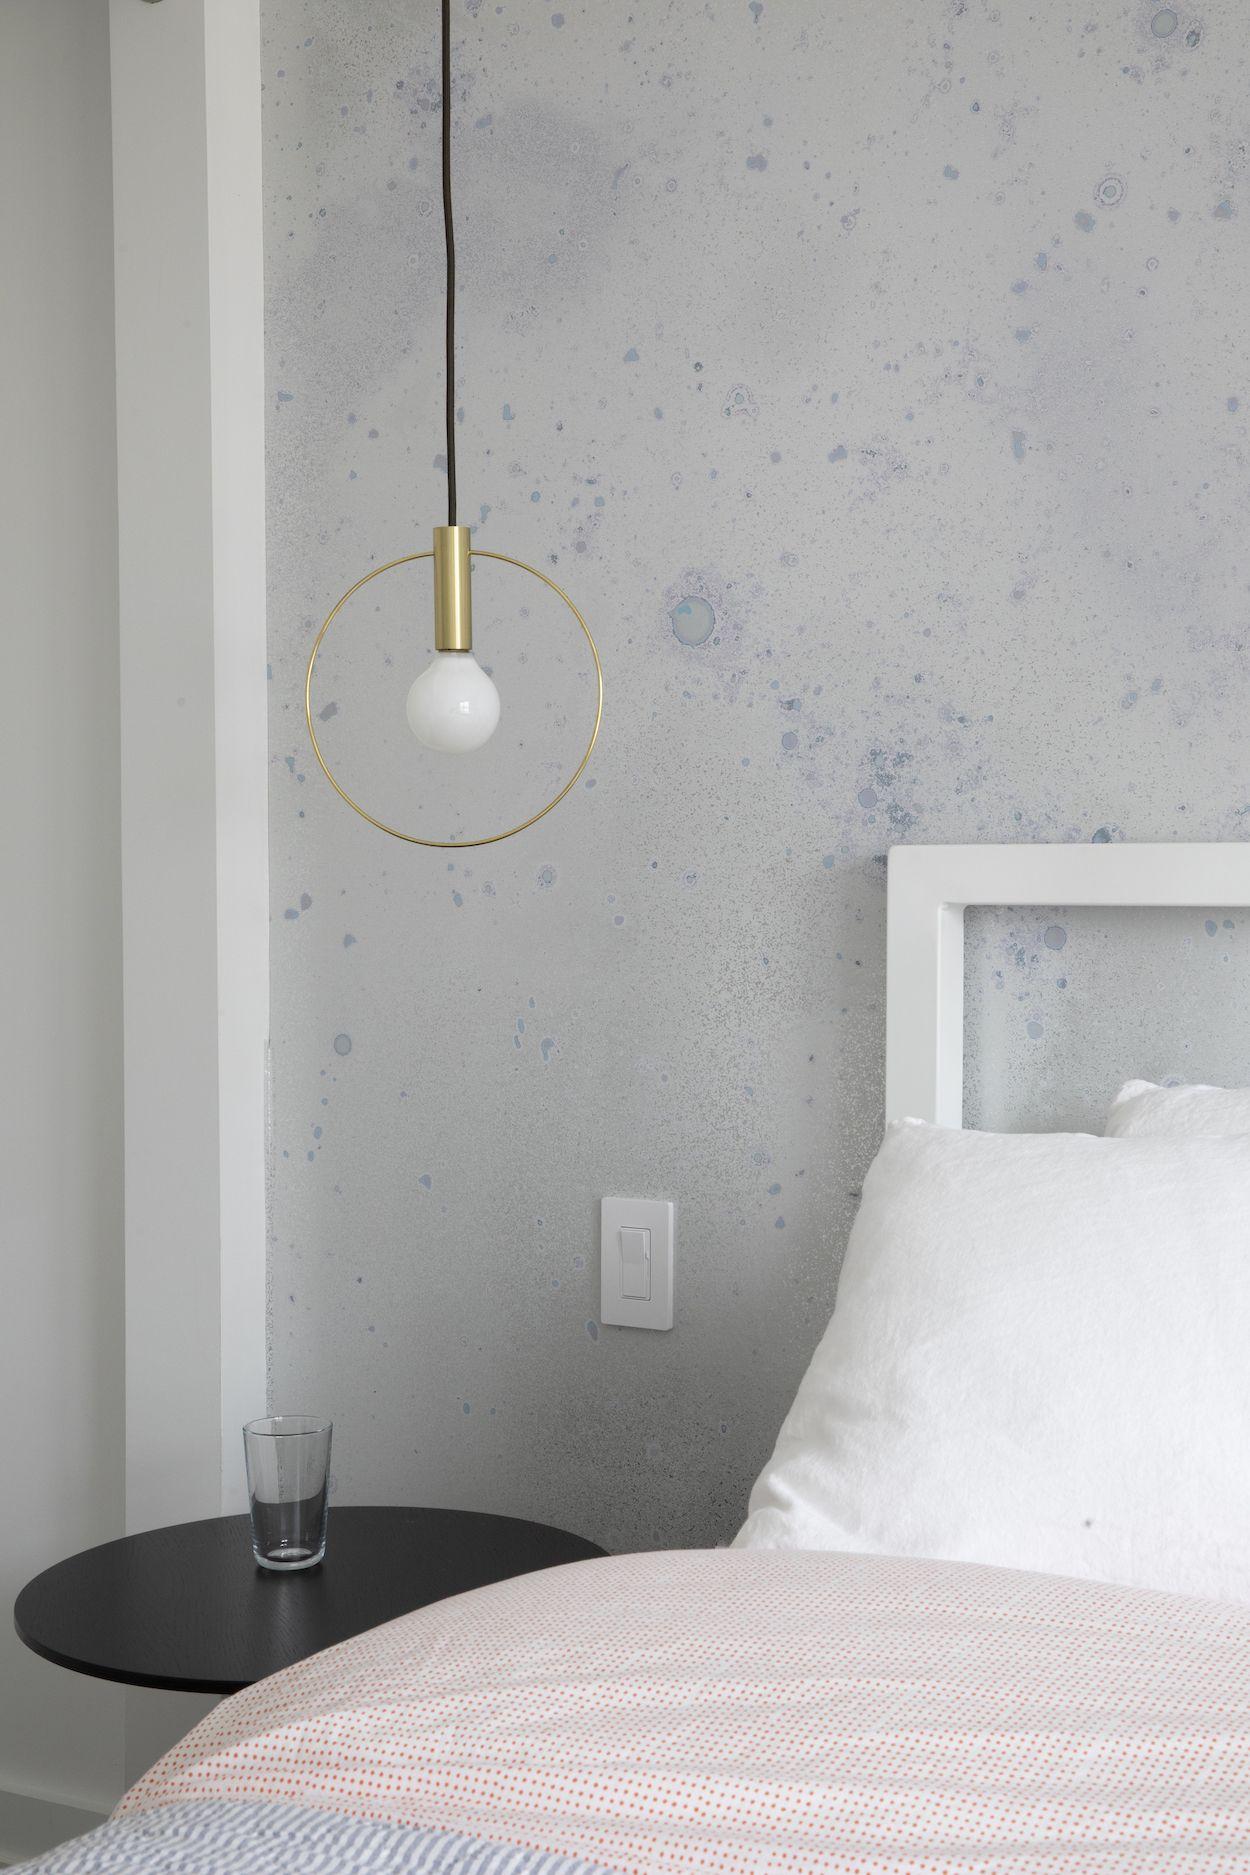 The Cedars Minimalist Home in Orient, New York - Design Milk